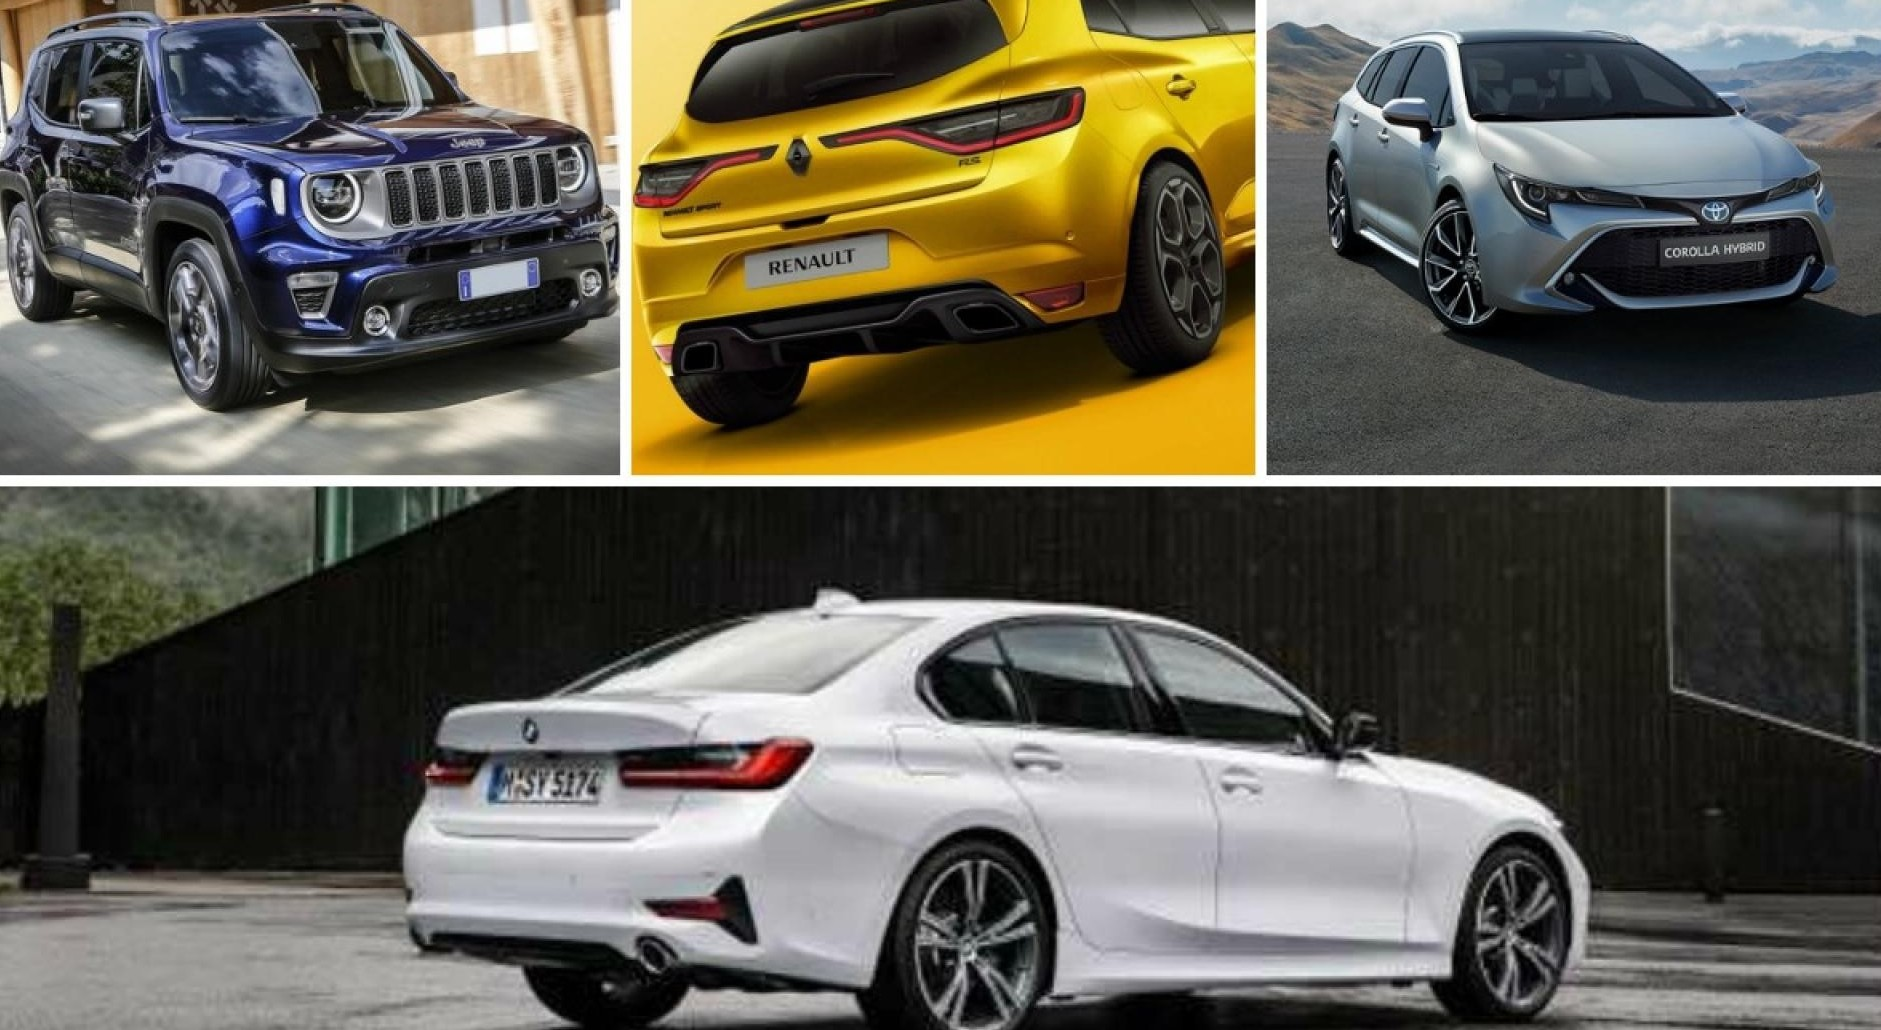 Auto ibride 2019-2020, i tre motivi per